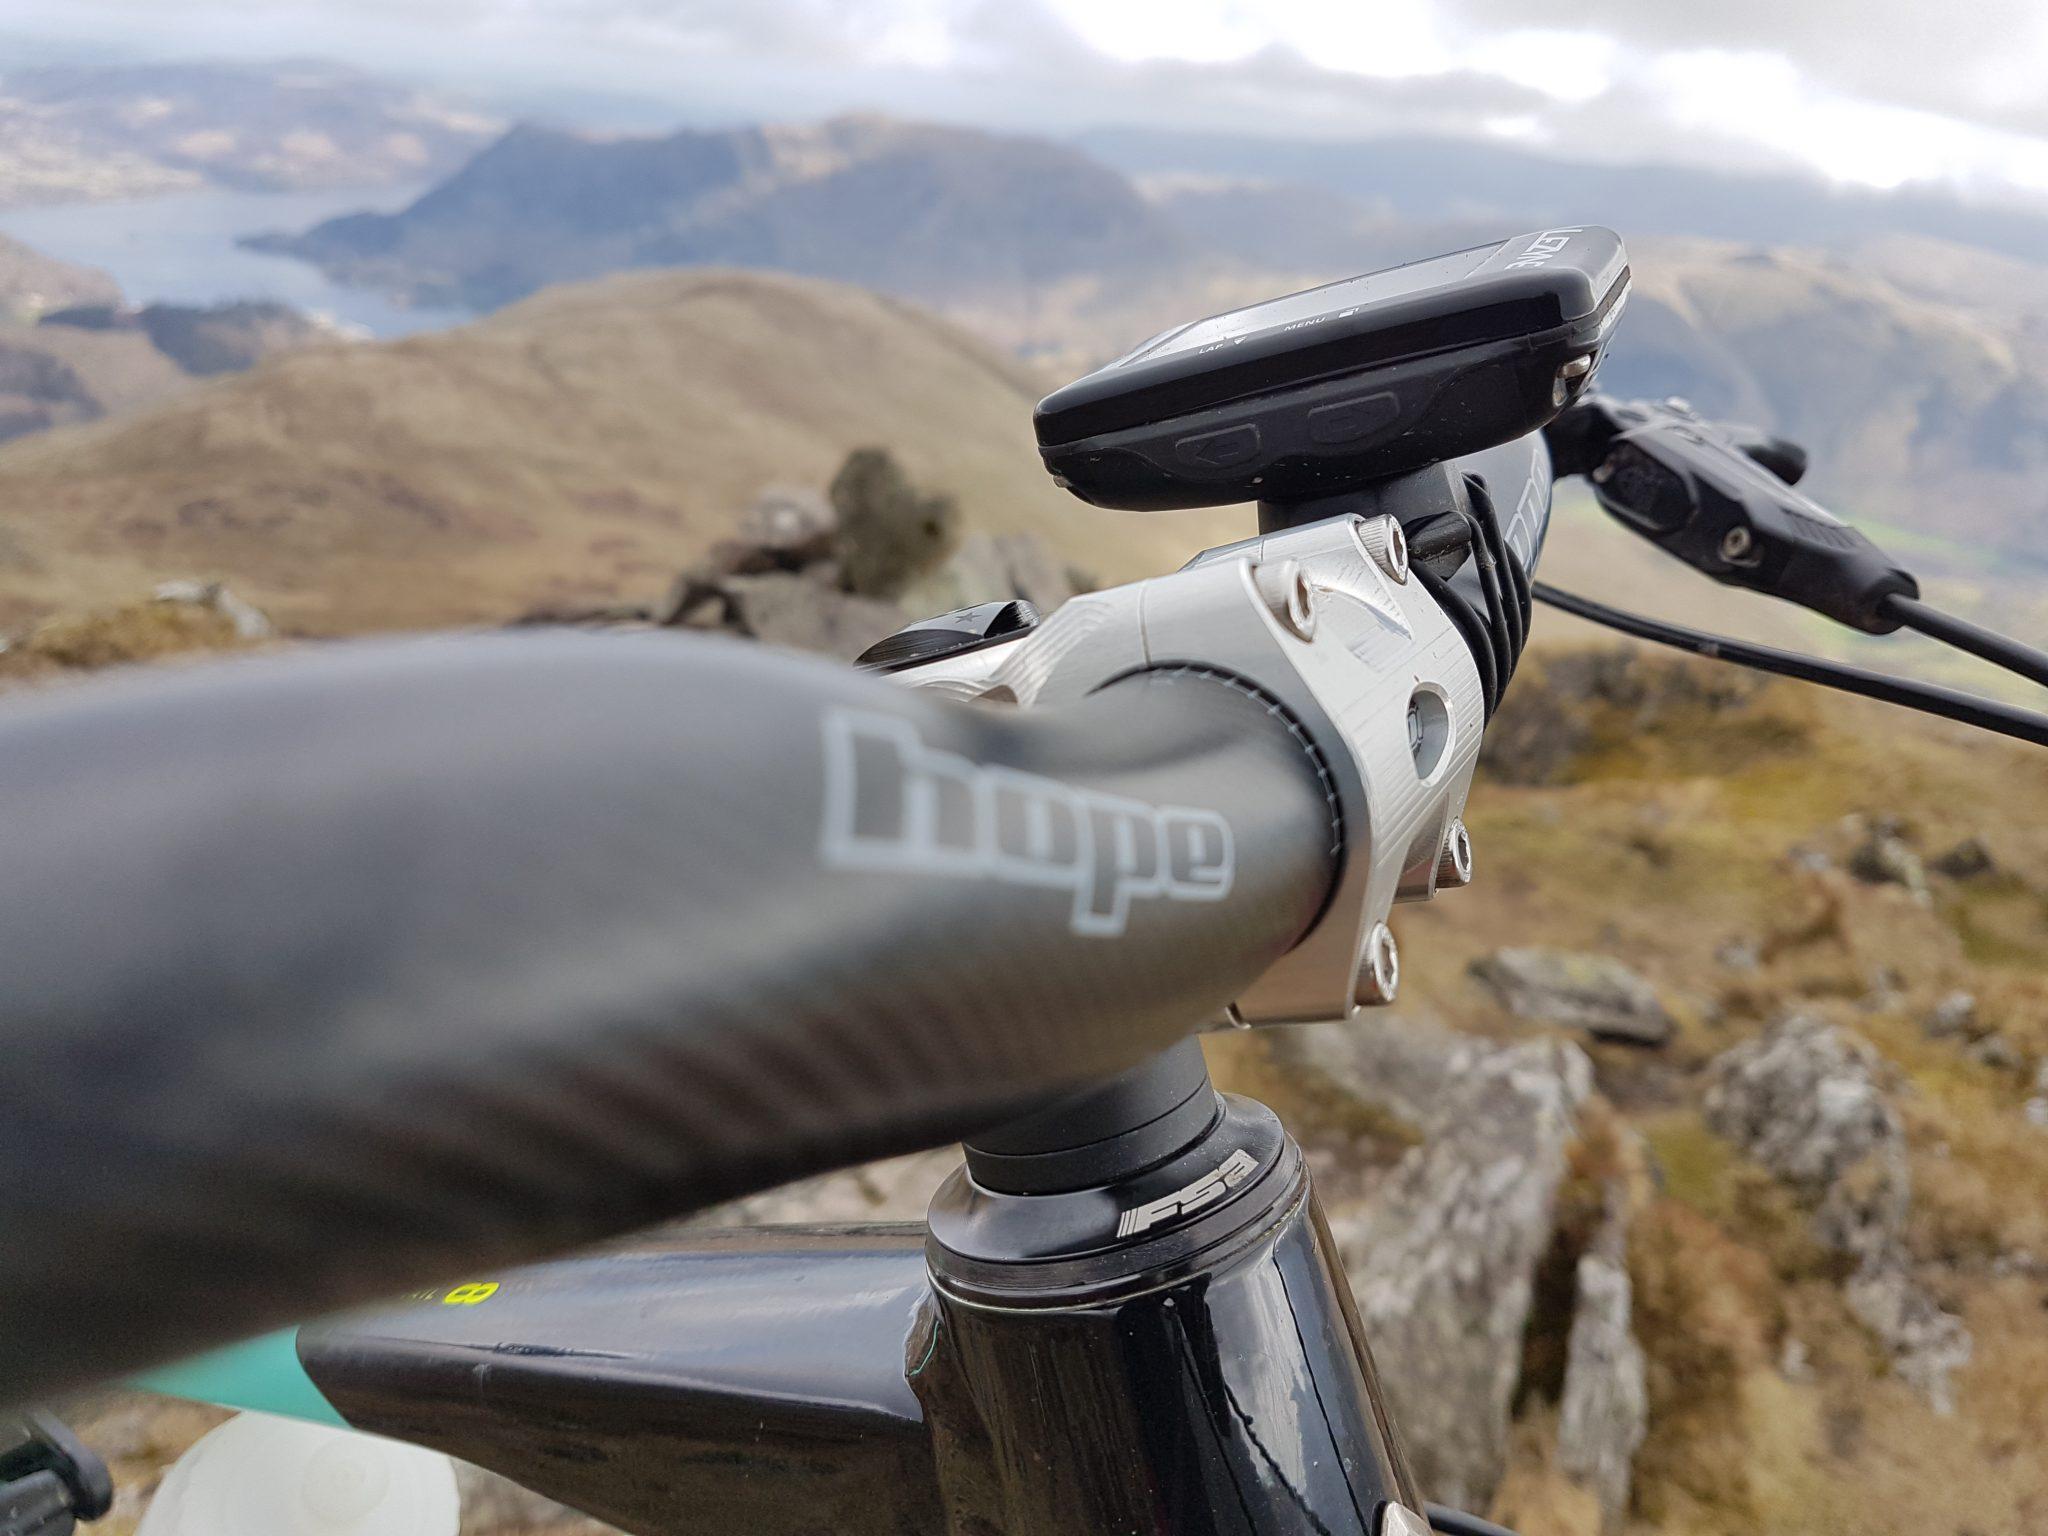 Bike Stem Mountain Bike Stem Bar Clamp for 31.8//35mm 70mm Bicycle Accessory